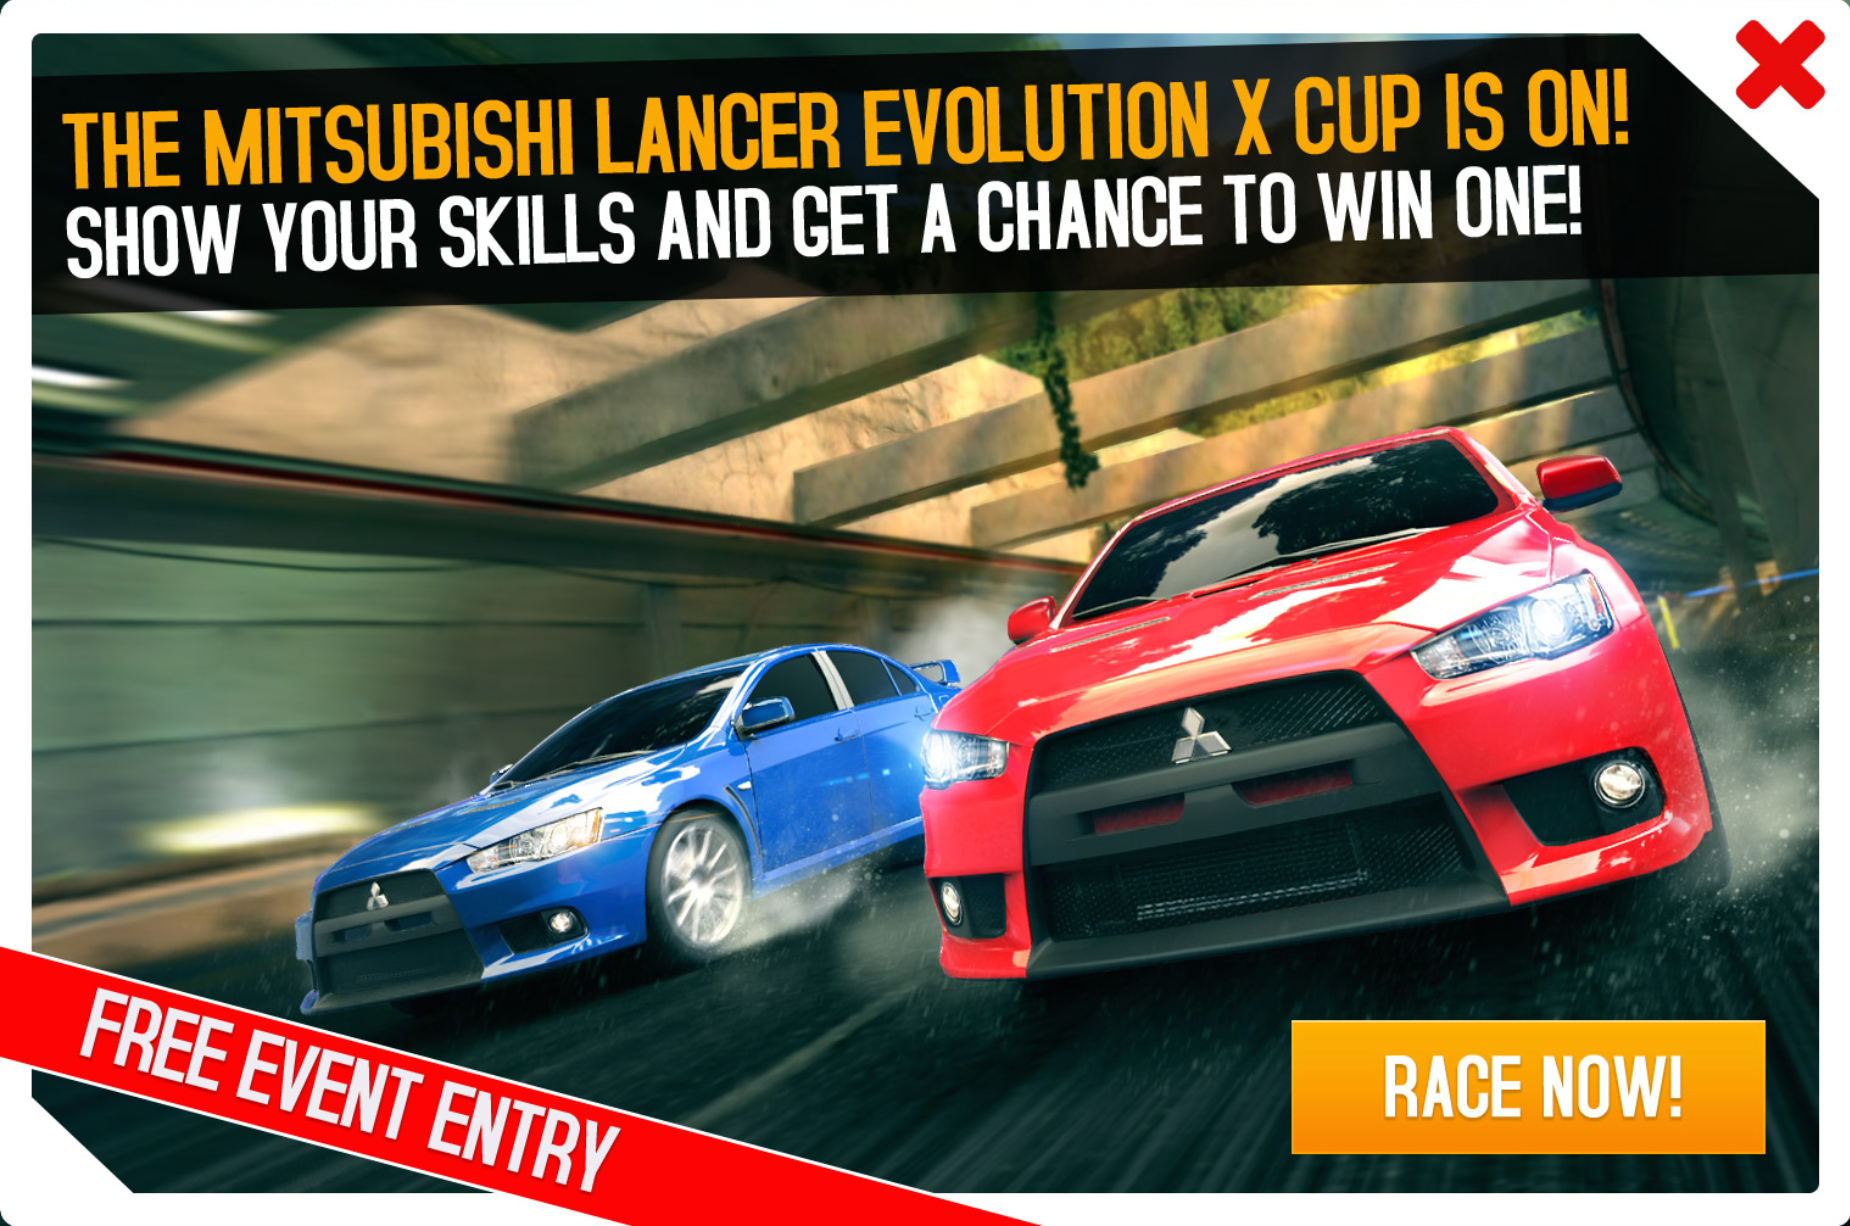 https://vignette.wikia.nocookie.net/asphalt/images/e/e3/Cup_ad_Mitsubishi_Lancer_Evolution_X.png/revision/latest?cb=20151020133732